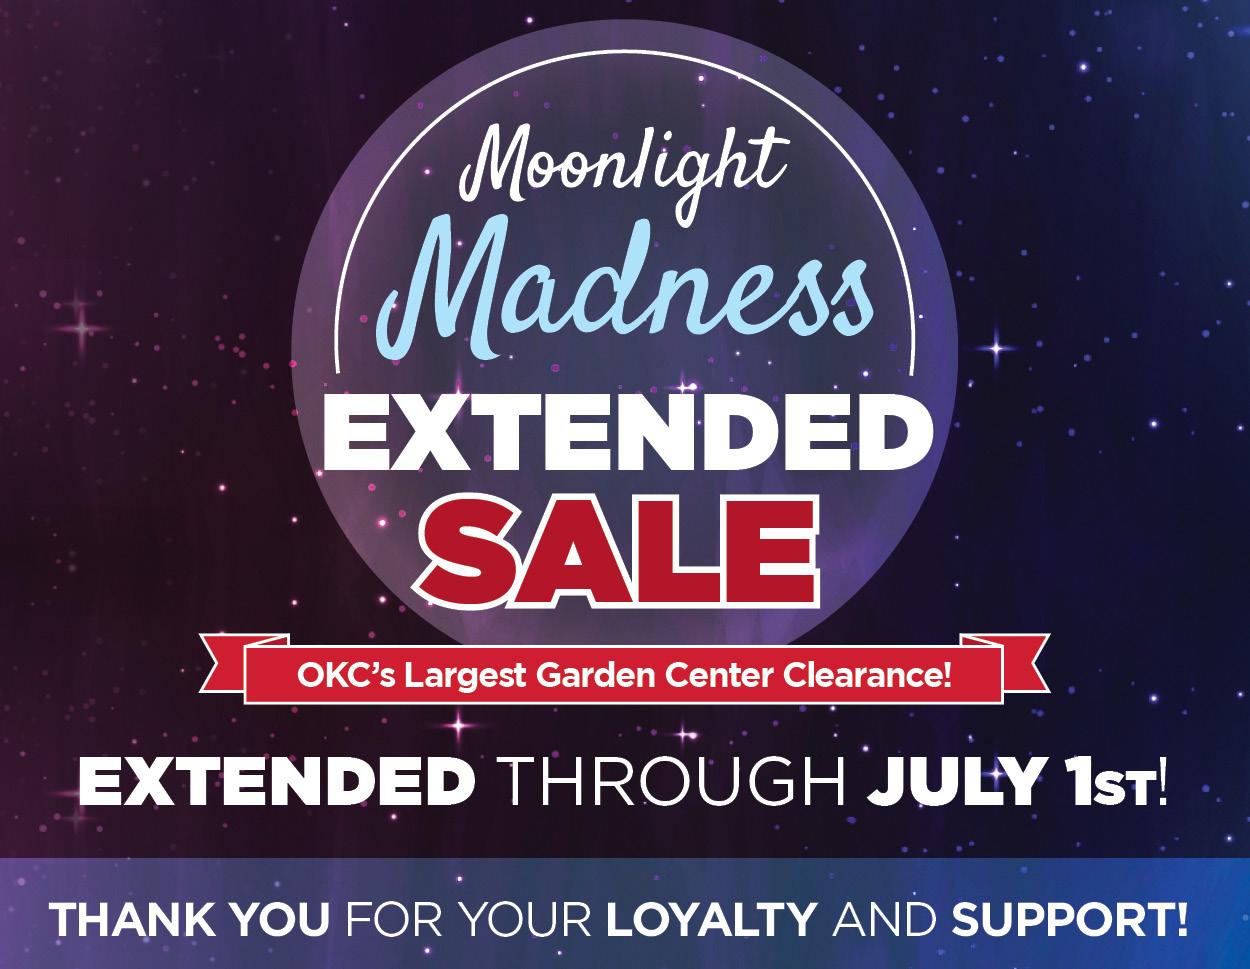 Moonlight Madness 2018 Extended